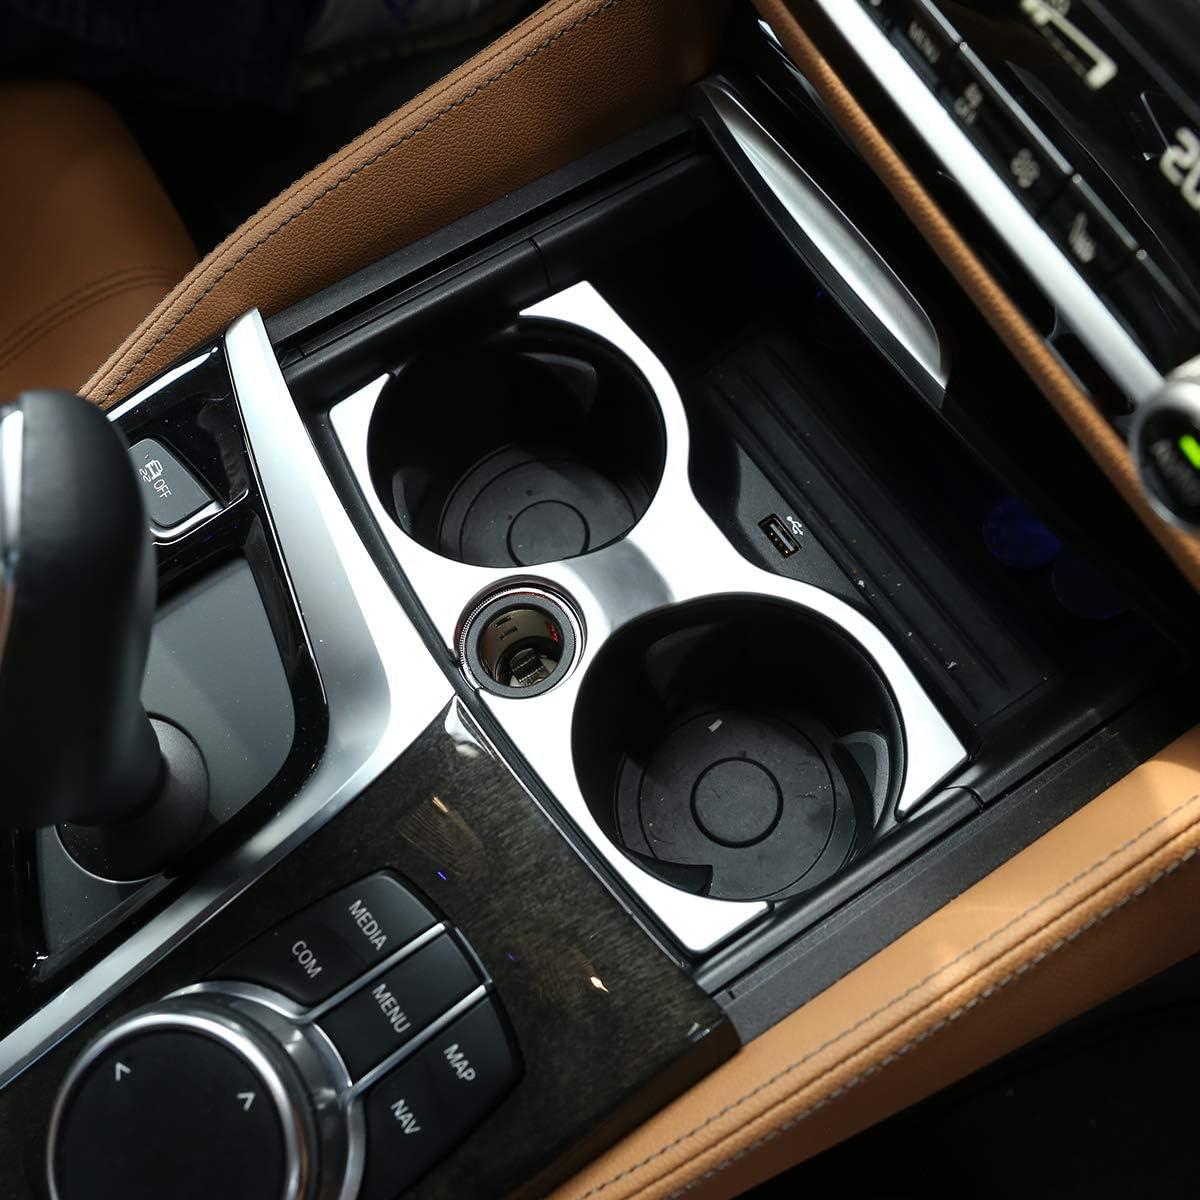 ABS Matte Cup Holder Decoration Frame Trim For 5 Series G30 G38 2018-2020